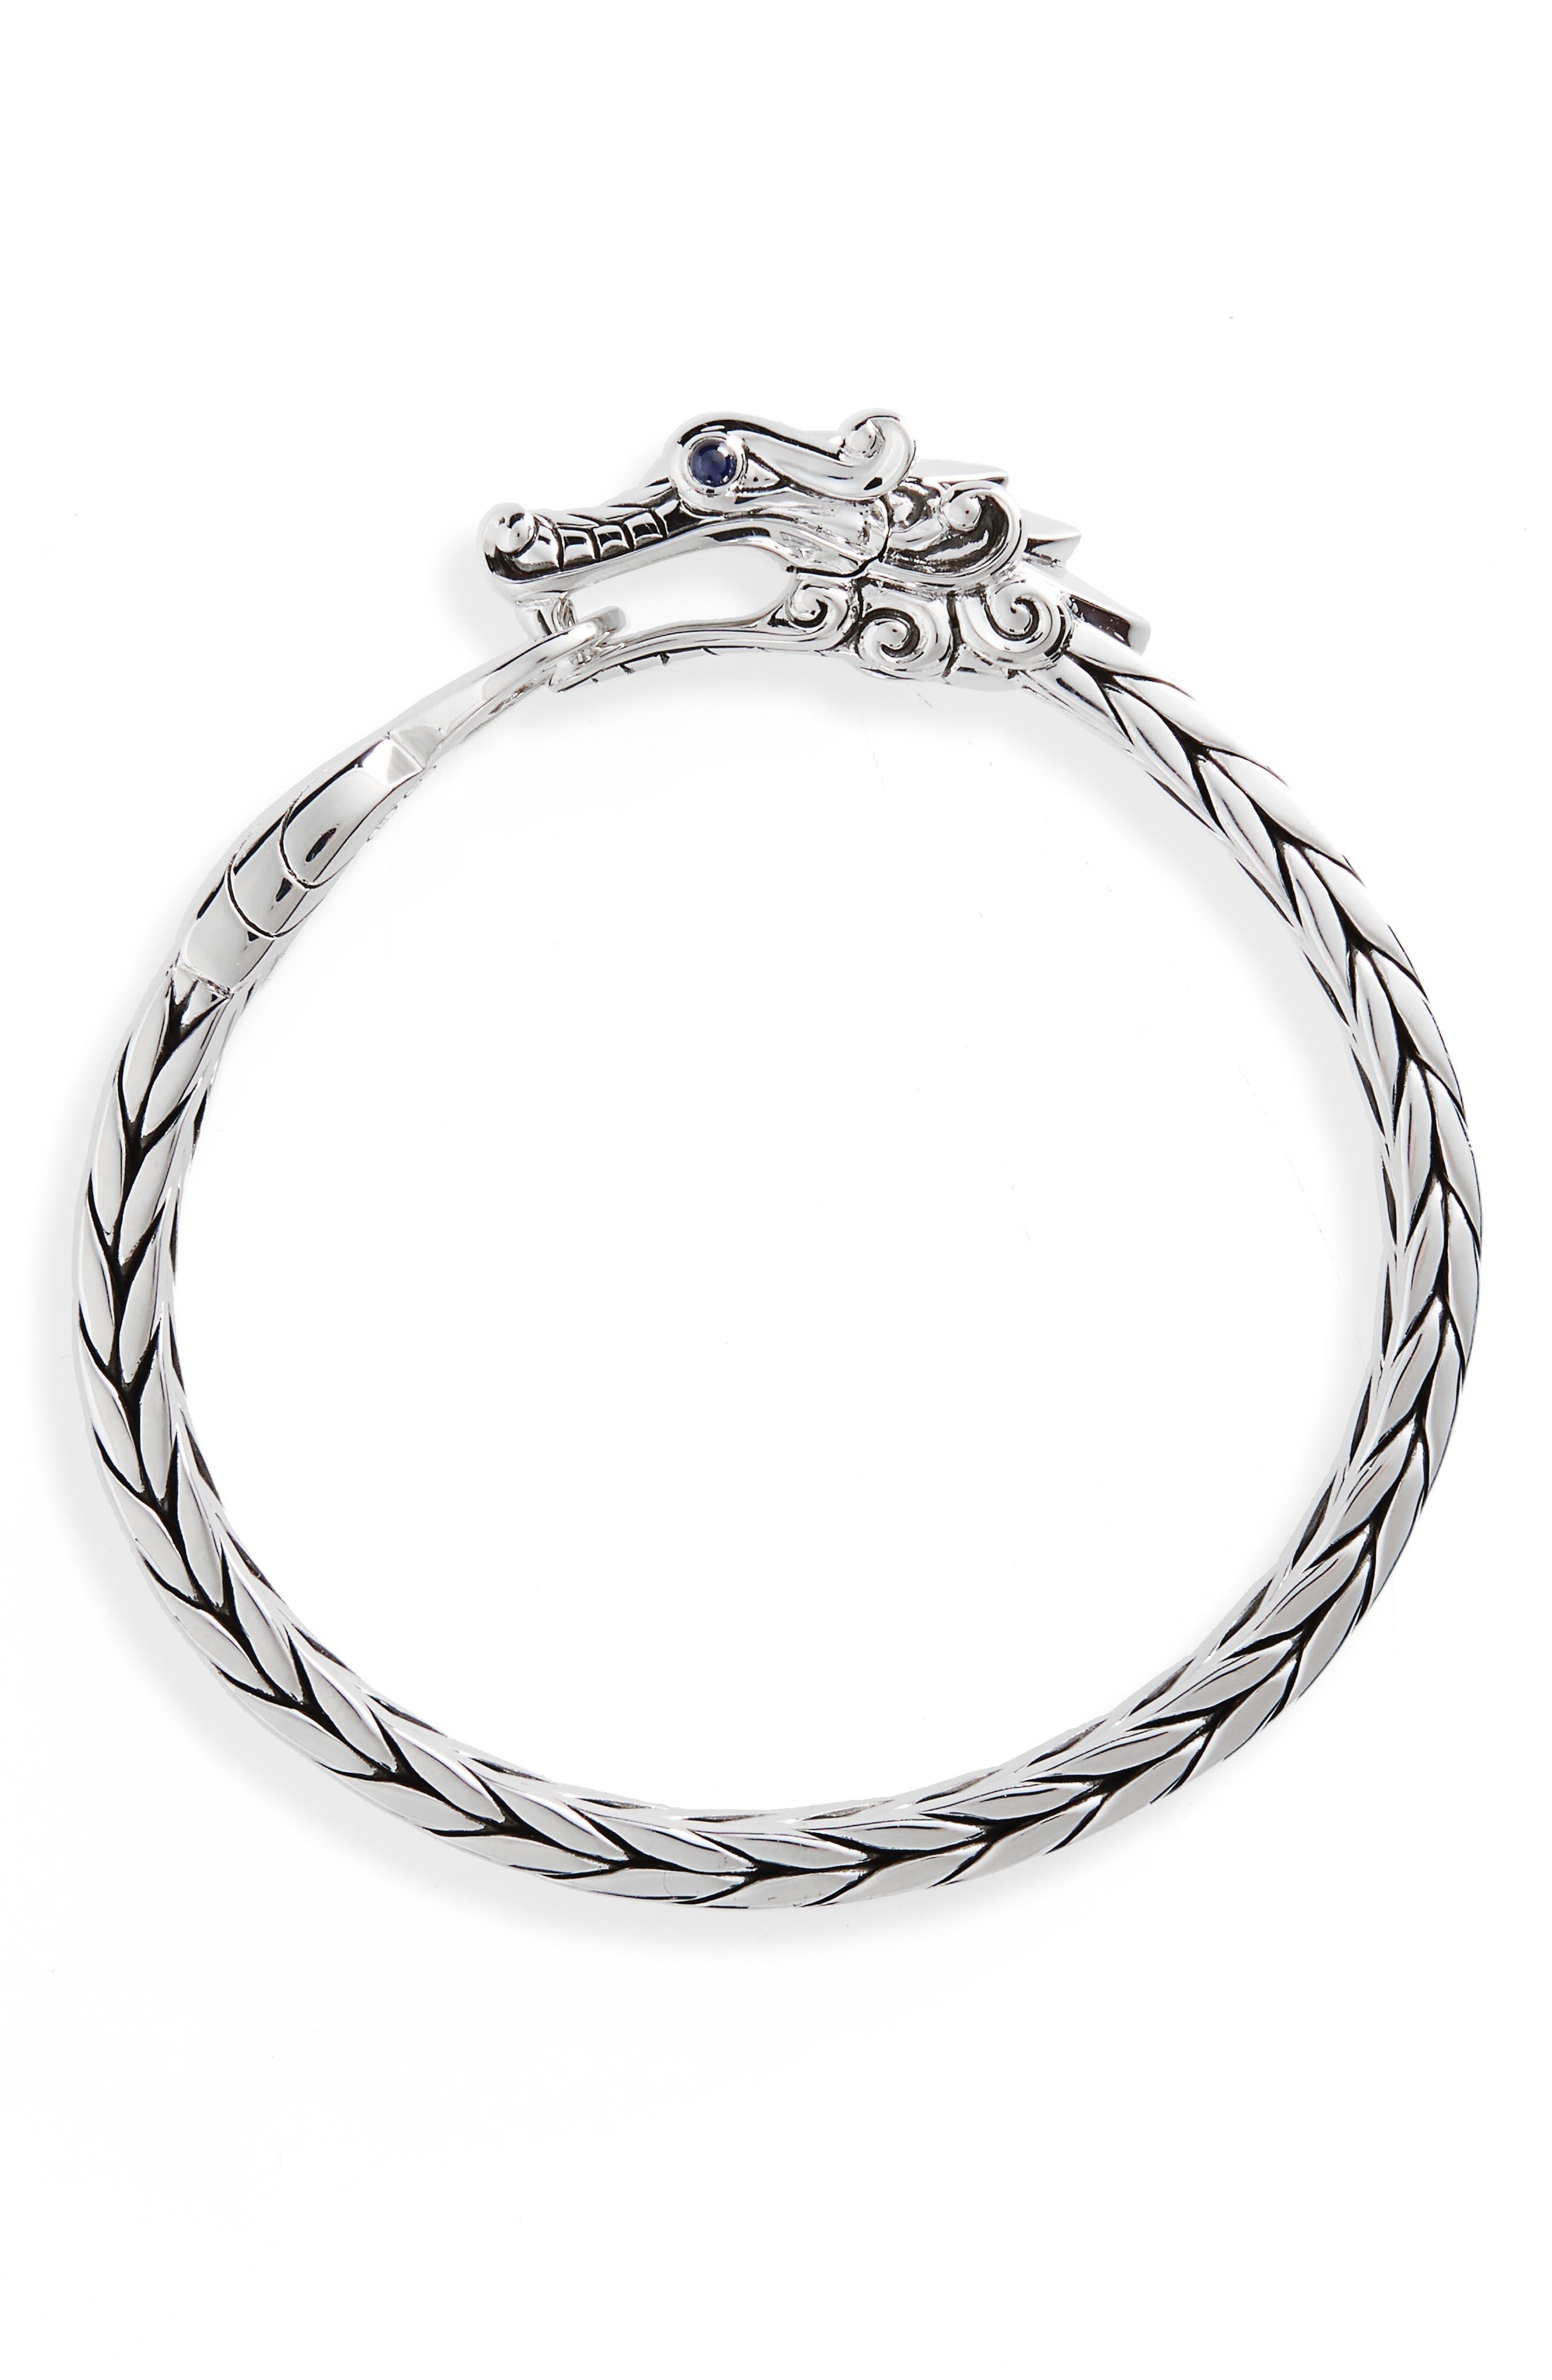 Main Image - John Hardy Legends Naga Sterling Silver Bracelet